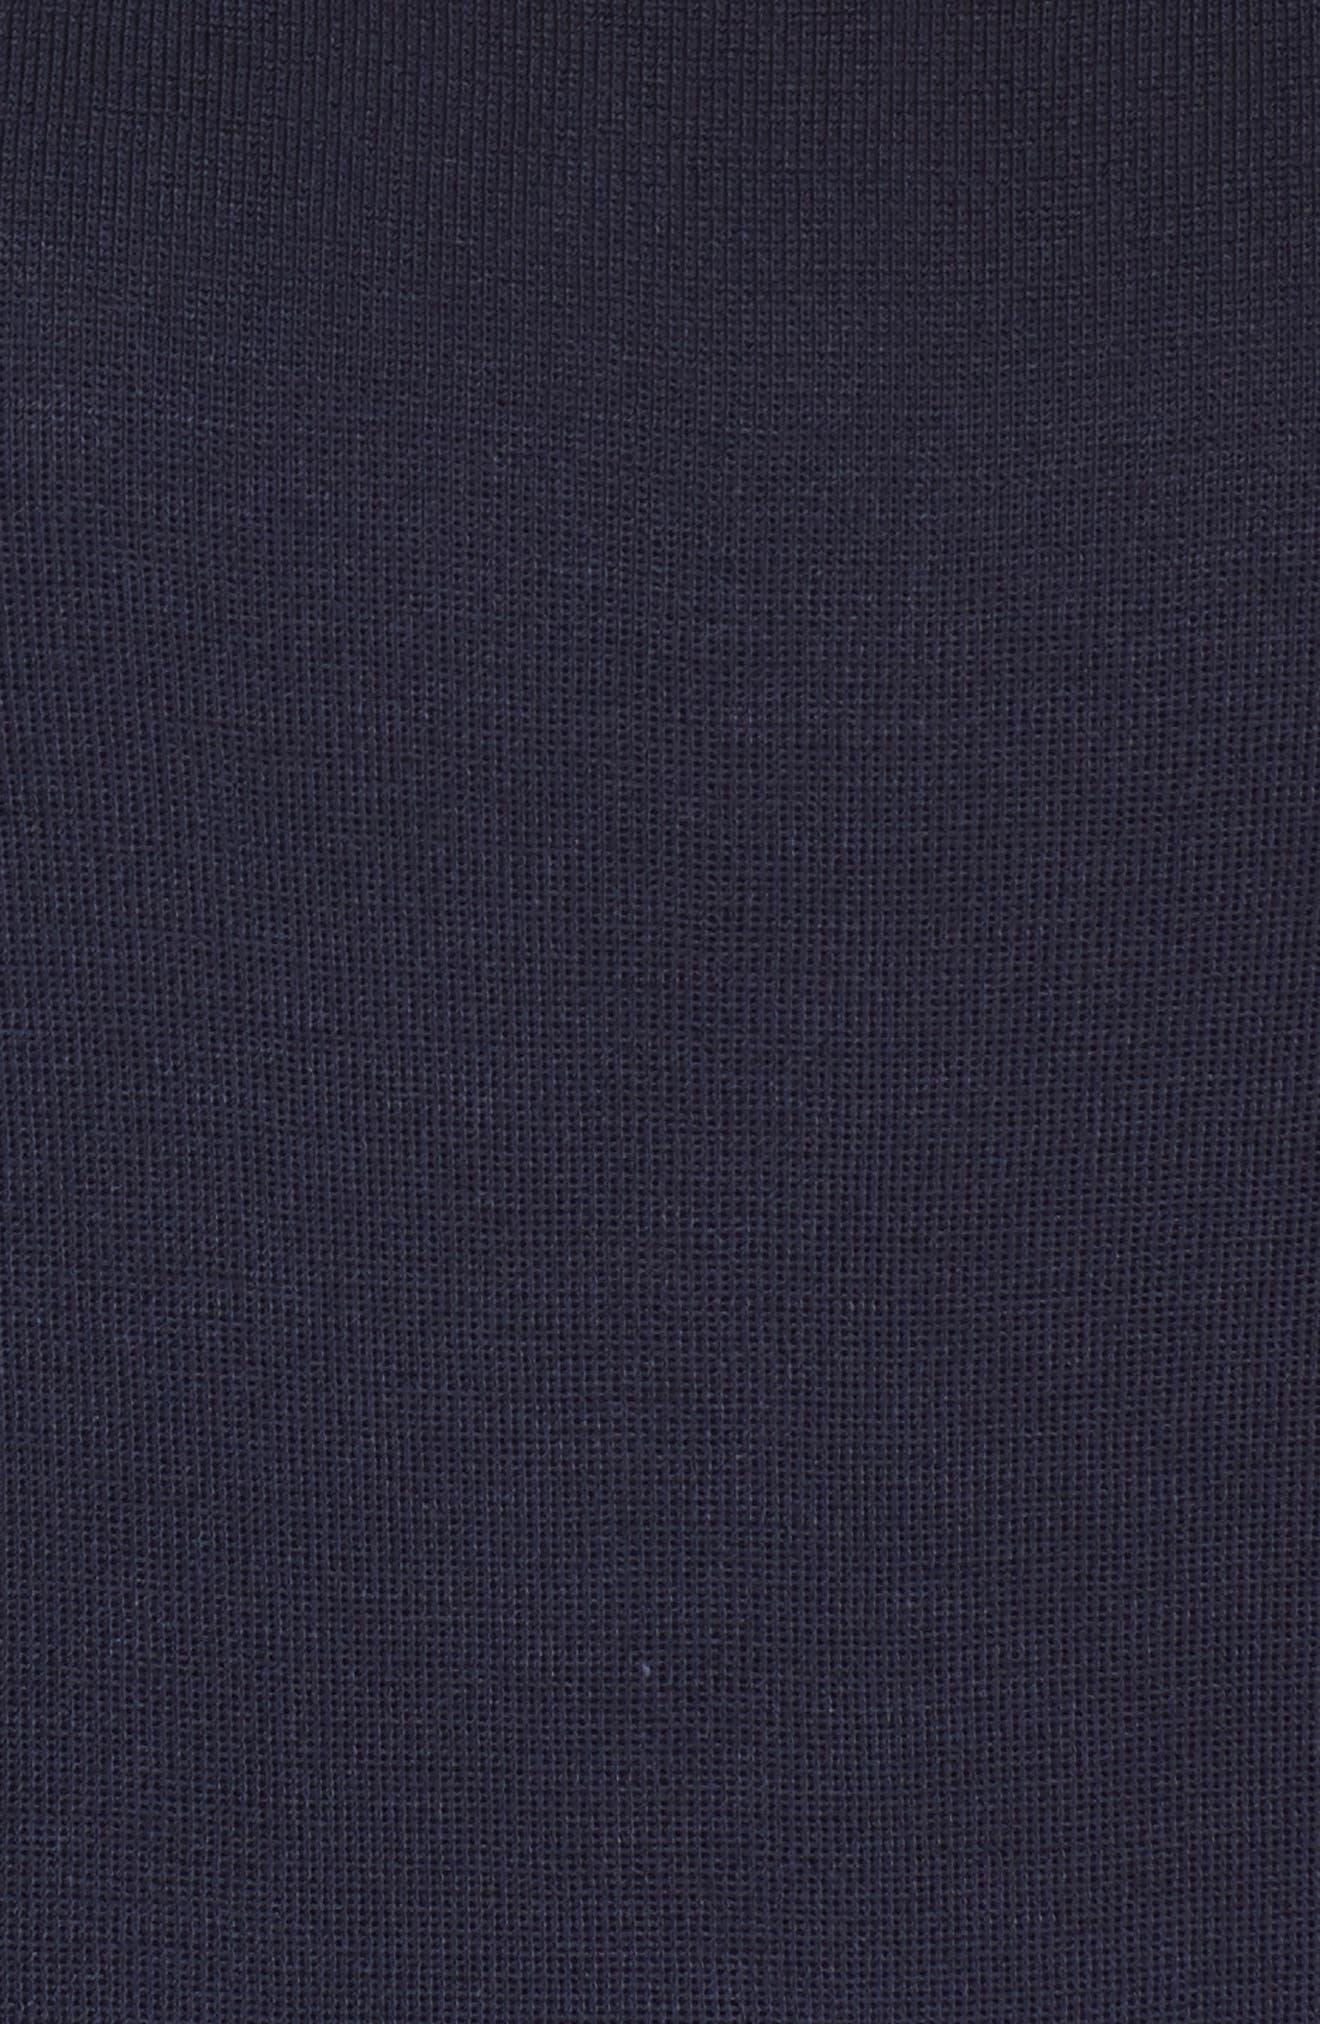 Alternate Image 5  - Ming Wang Scoop Neck Knit Tank